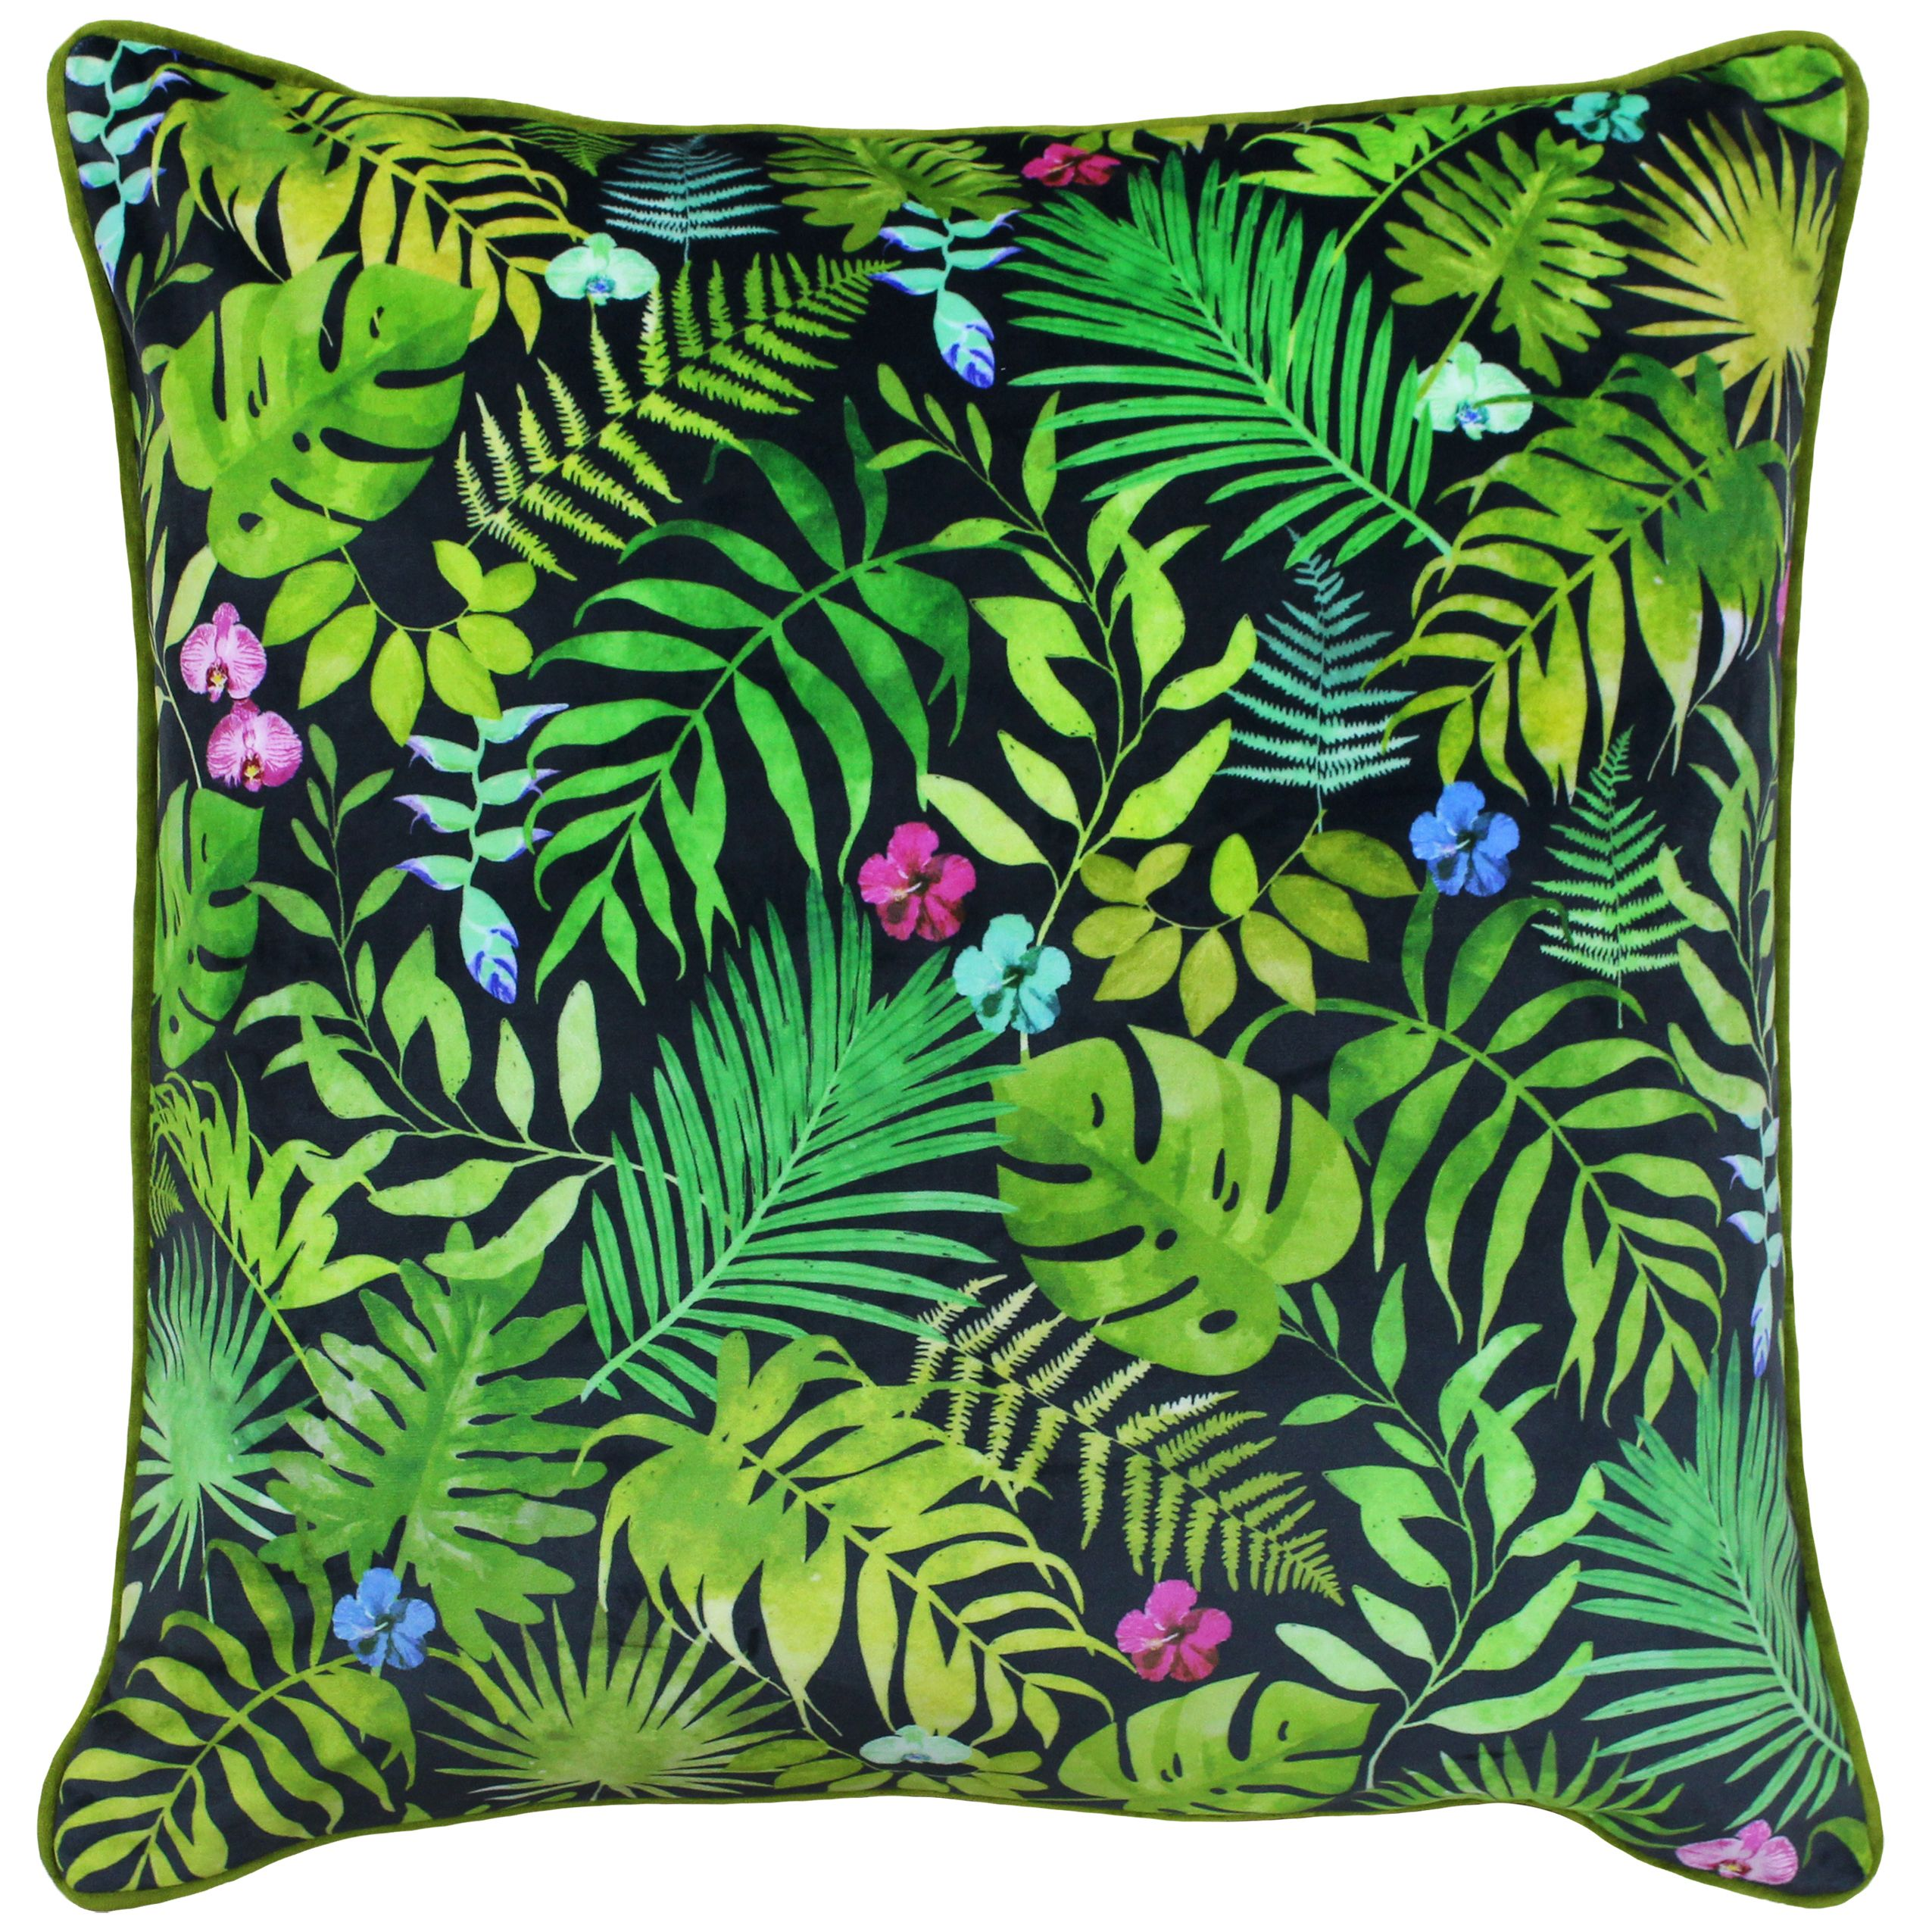 Botanical Polyester Filled Cushion